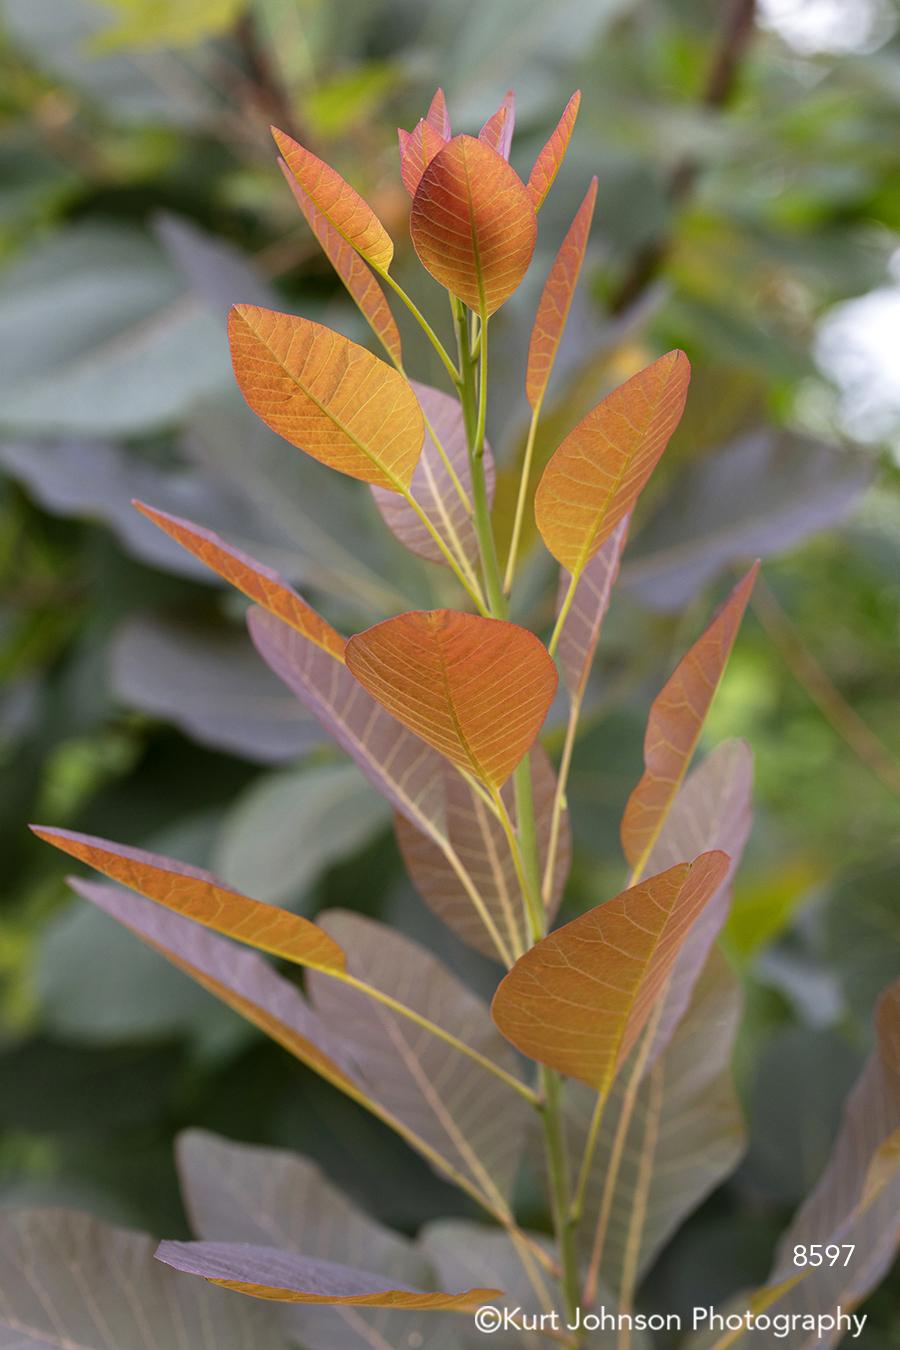 orange leaves plant close up details macro green